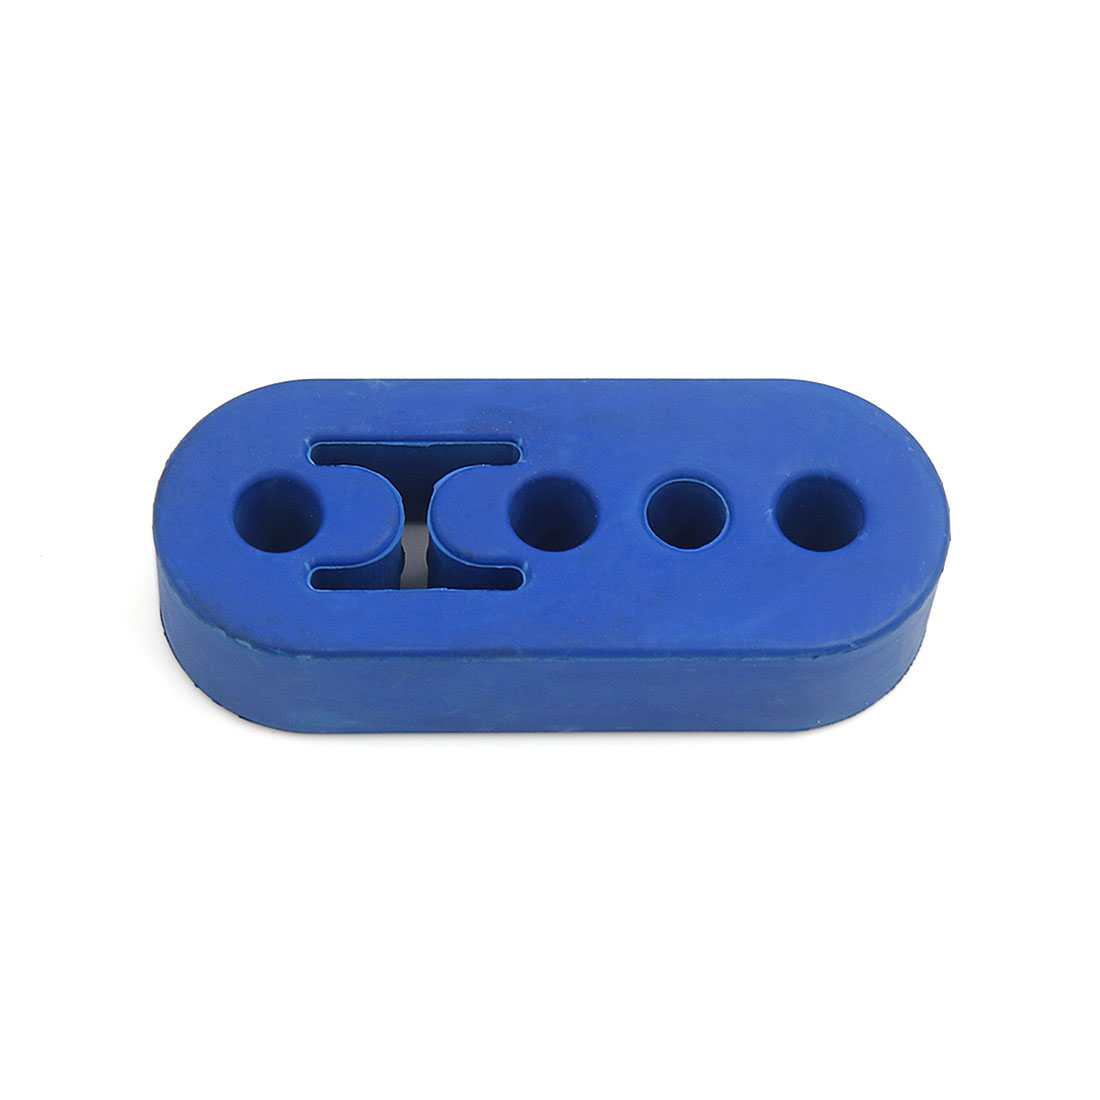 Universal 12mm Hole Blue Rubber Exhaust Tail Pipe Mount Bracket Hanger Insulator